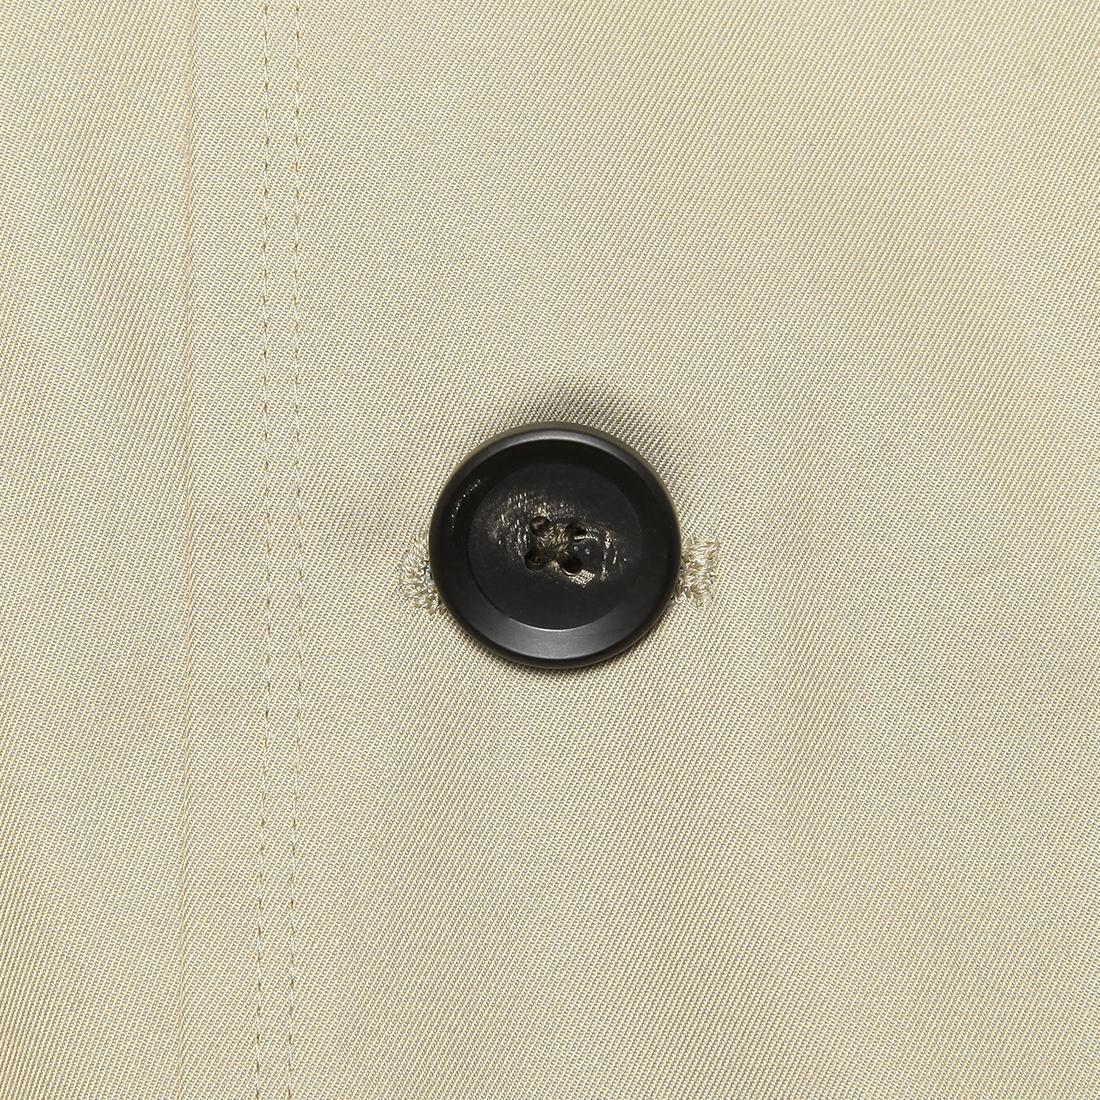 Cotton Gabardine Trench Coat 1225079: Beige